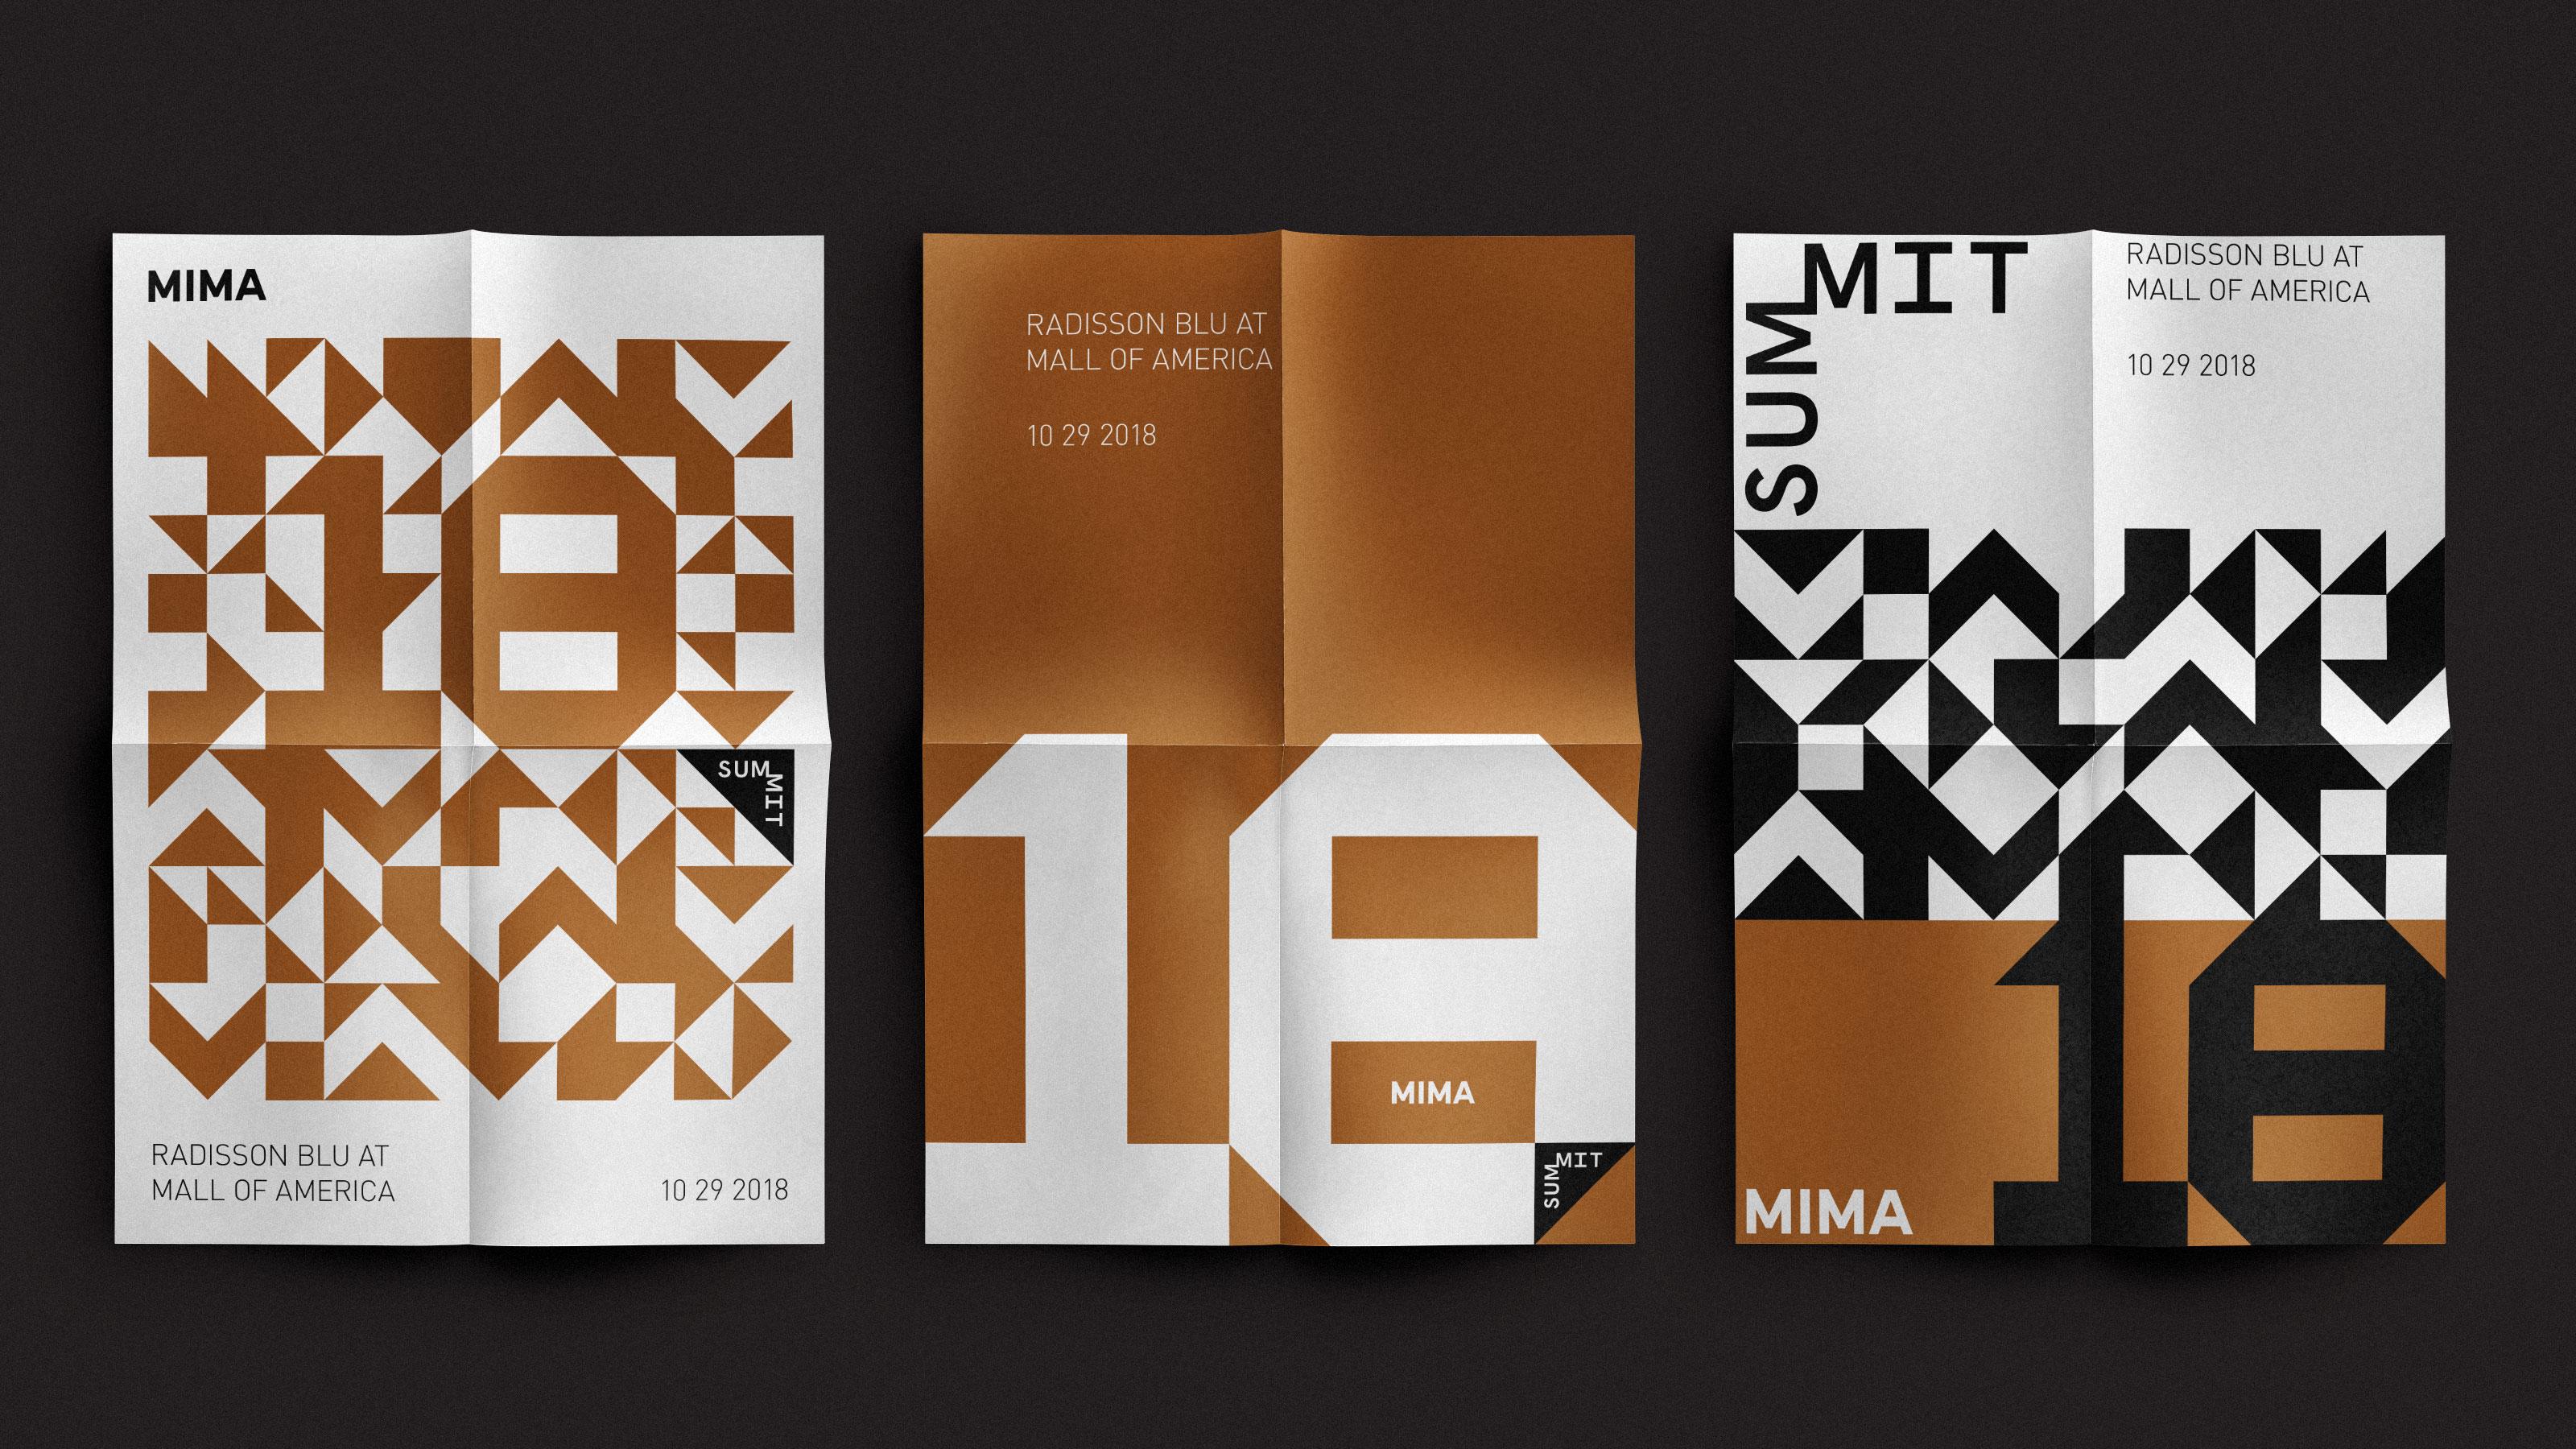 MIMA_Summit_2018_Posters_1